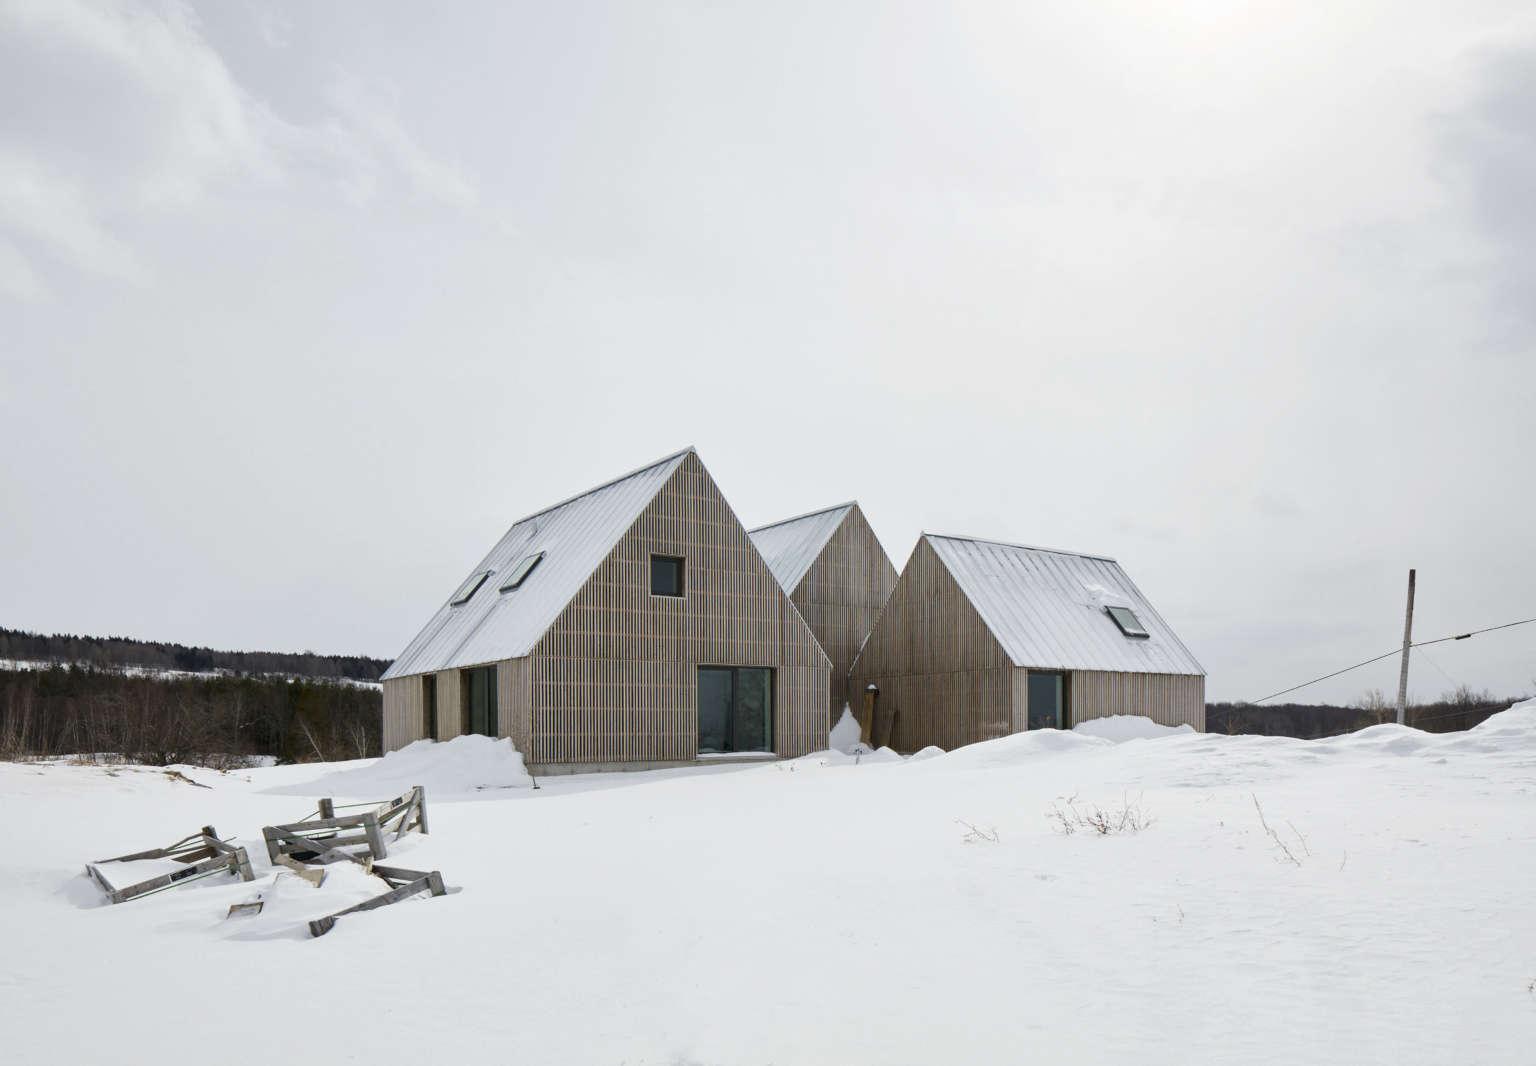 hatley house quebec pelletier de fontenay and francois abbott exterior